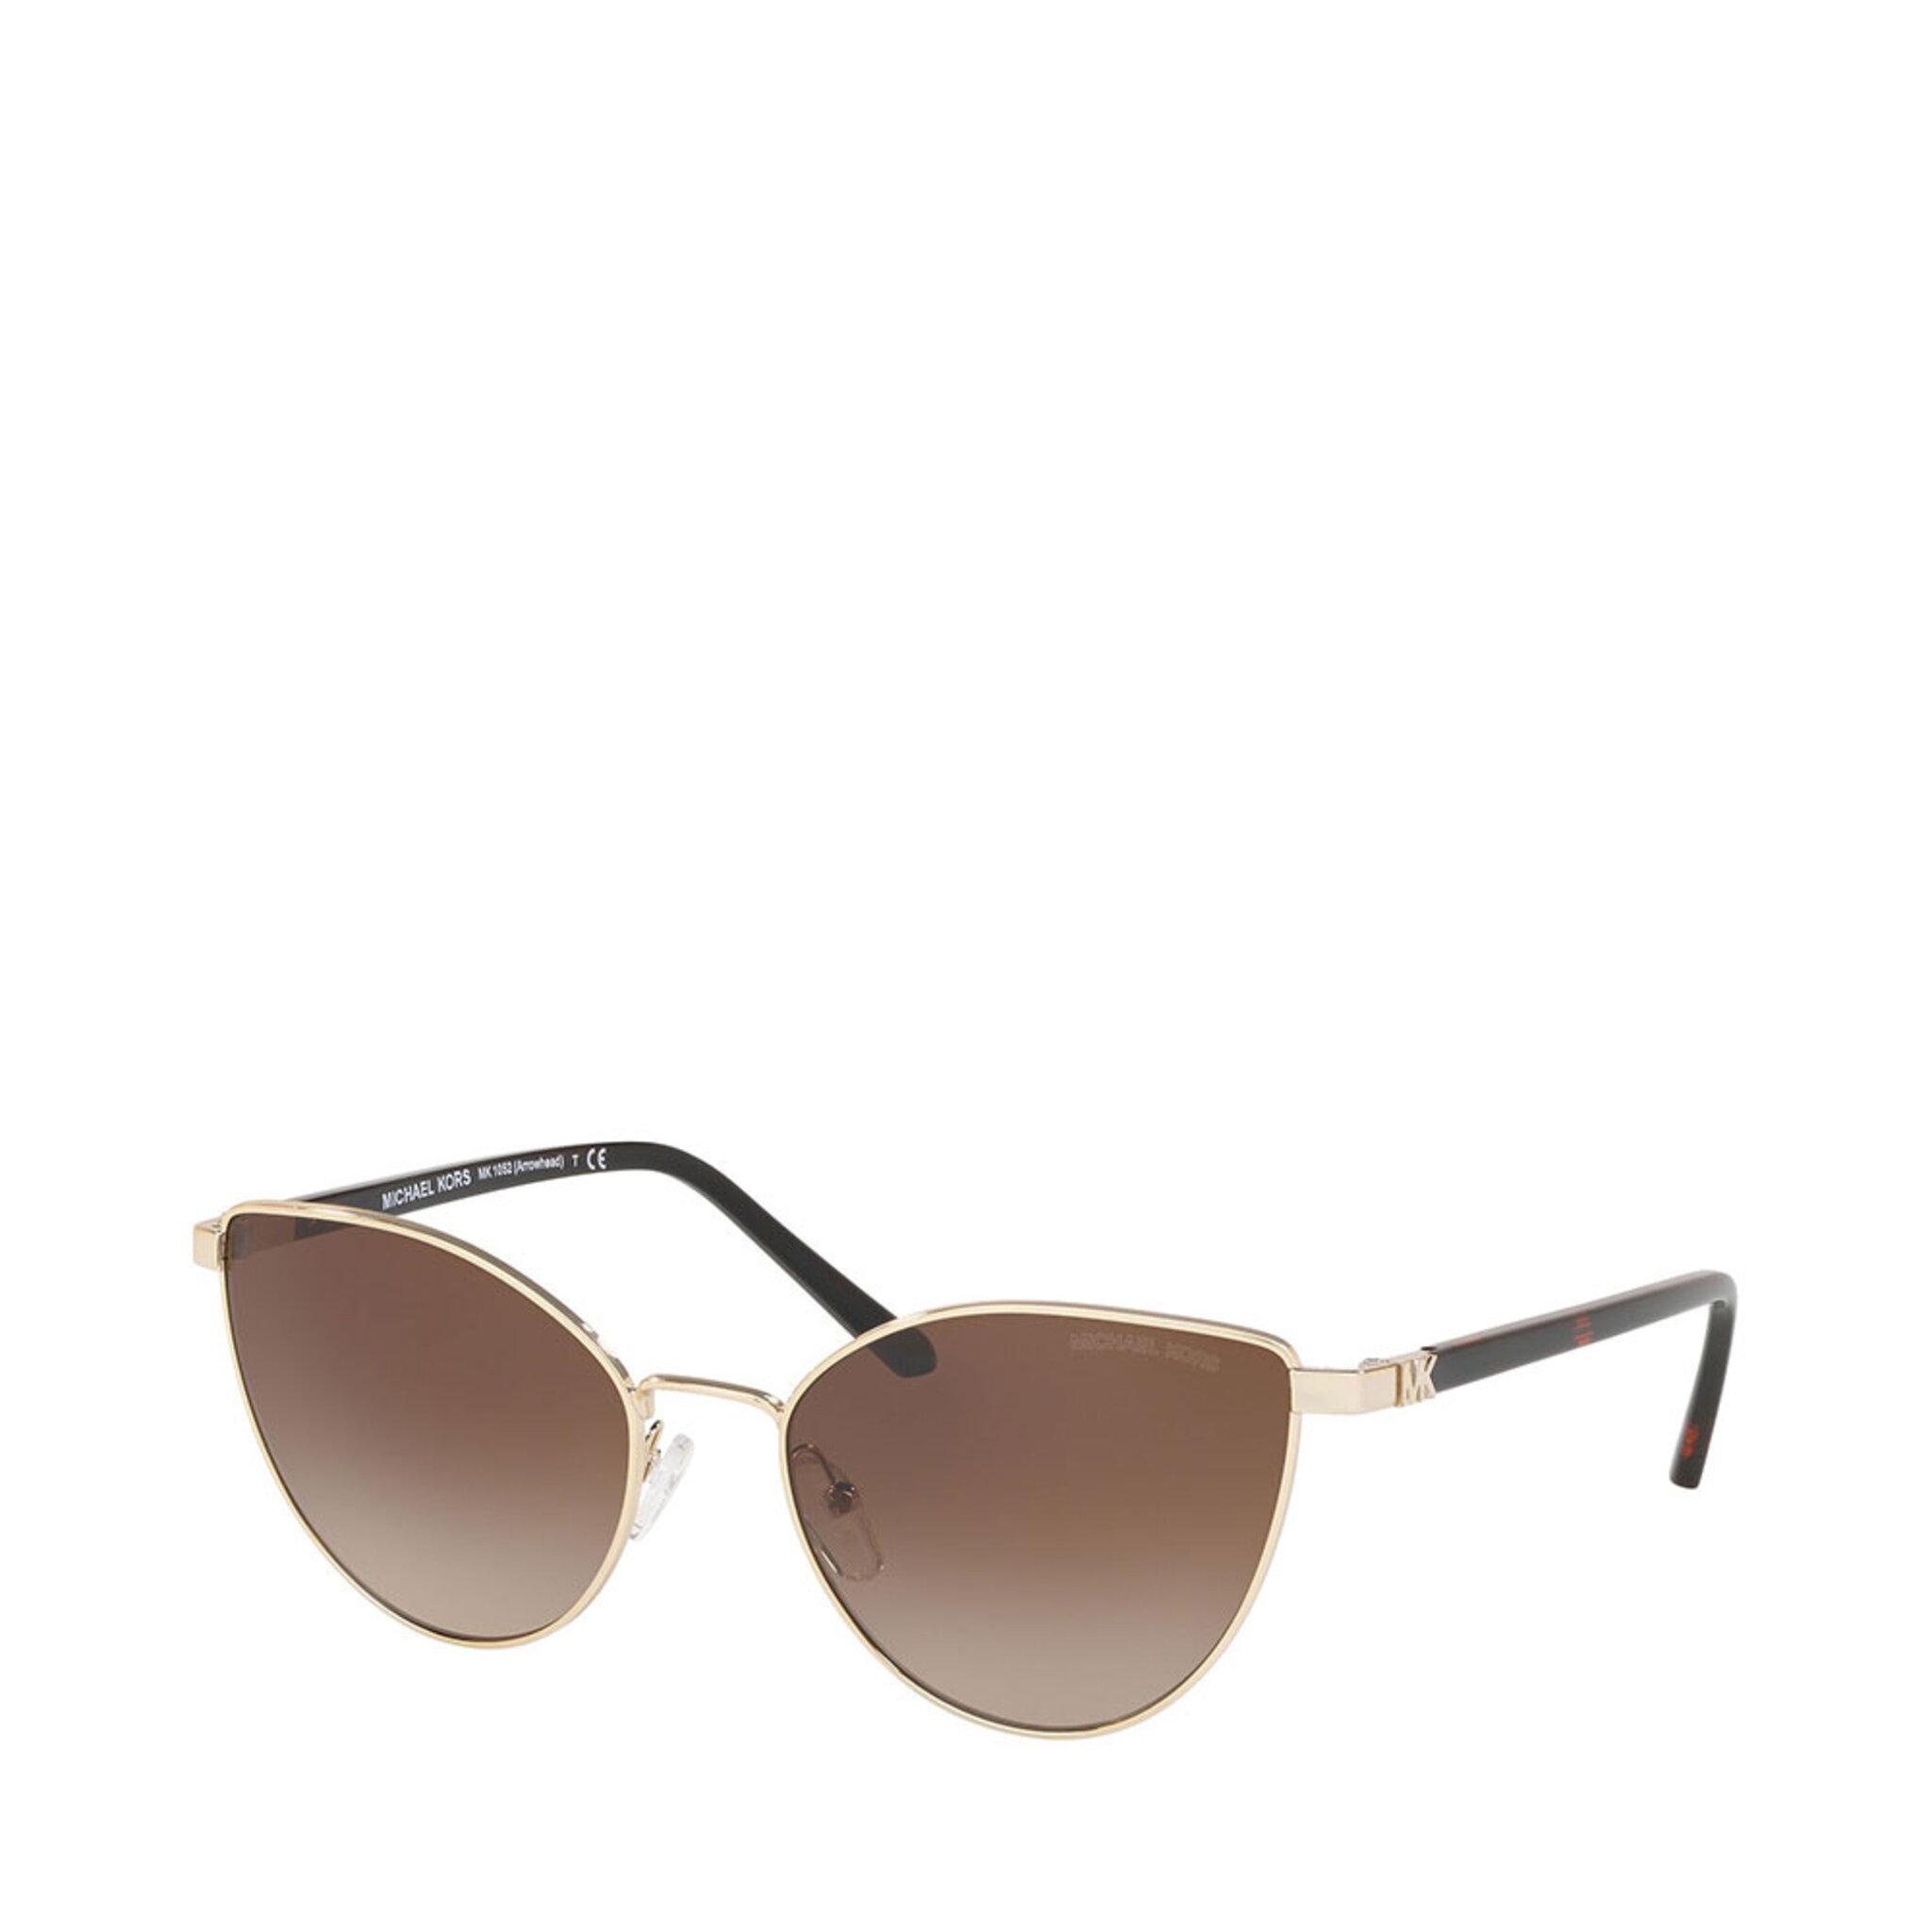 Sunglasses ARROWHEAD, 57